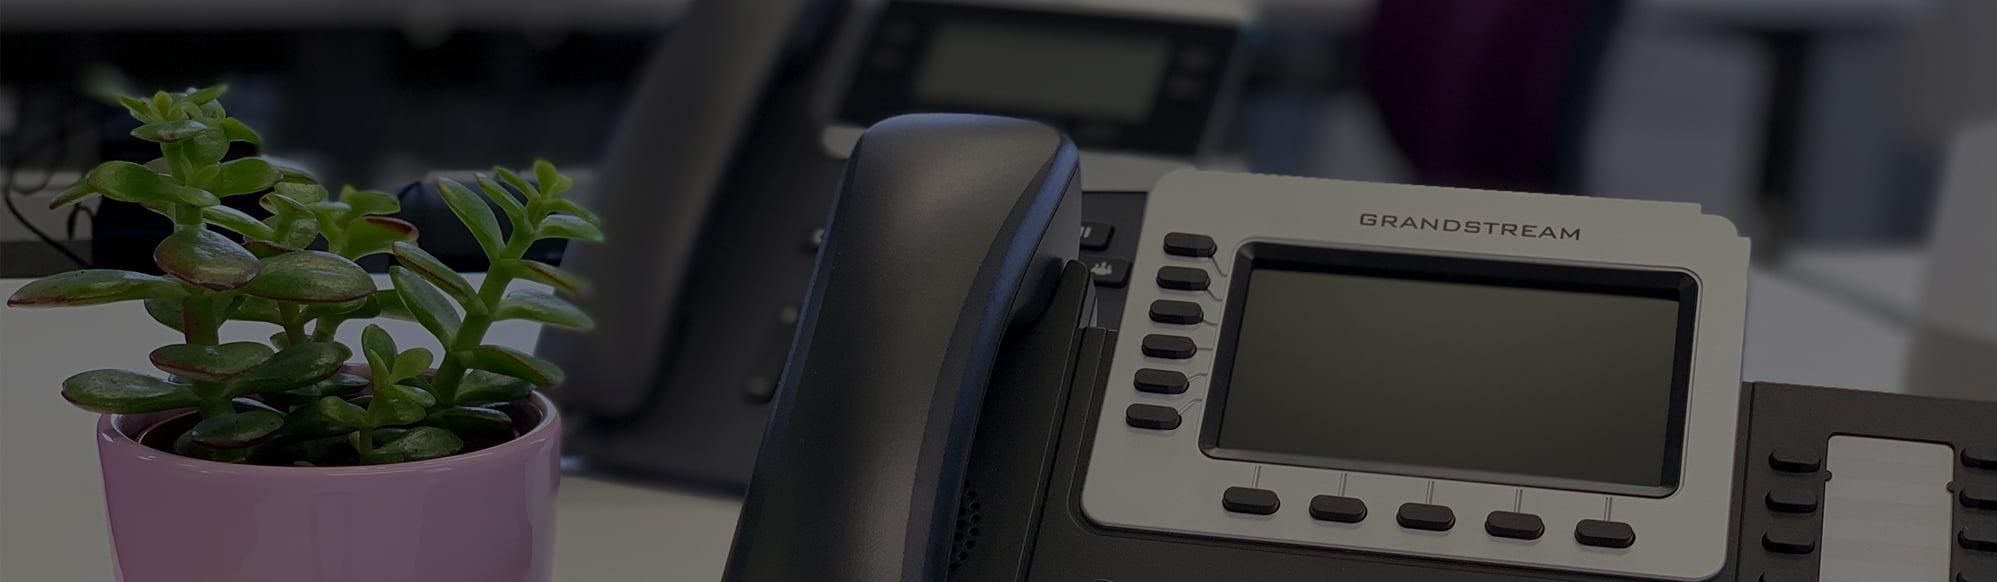 Business Phone Price Plans